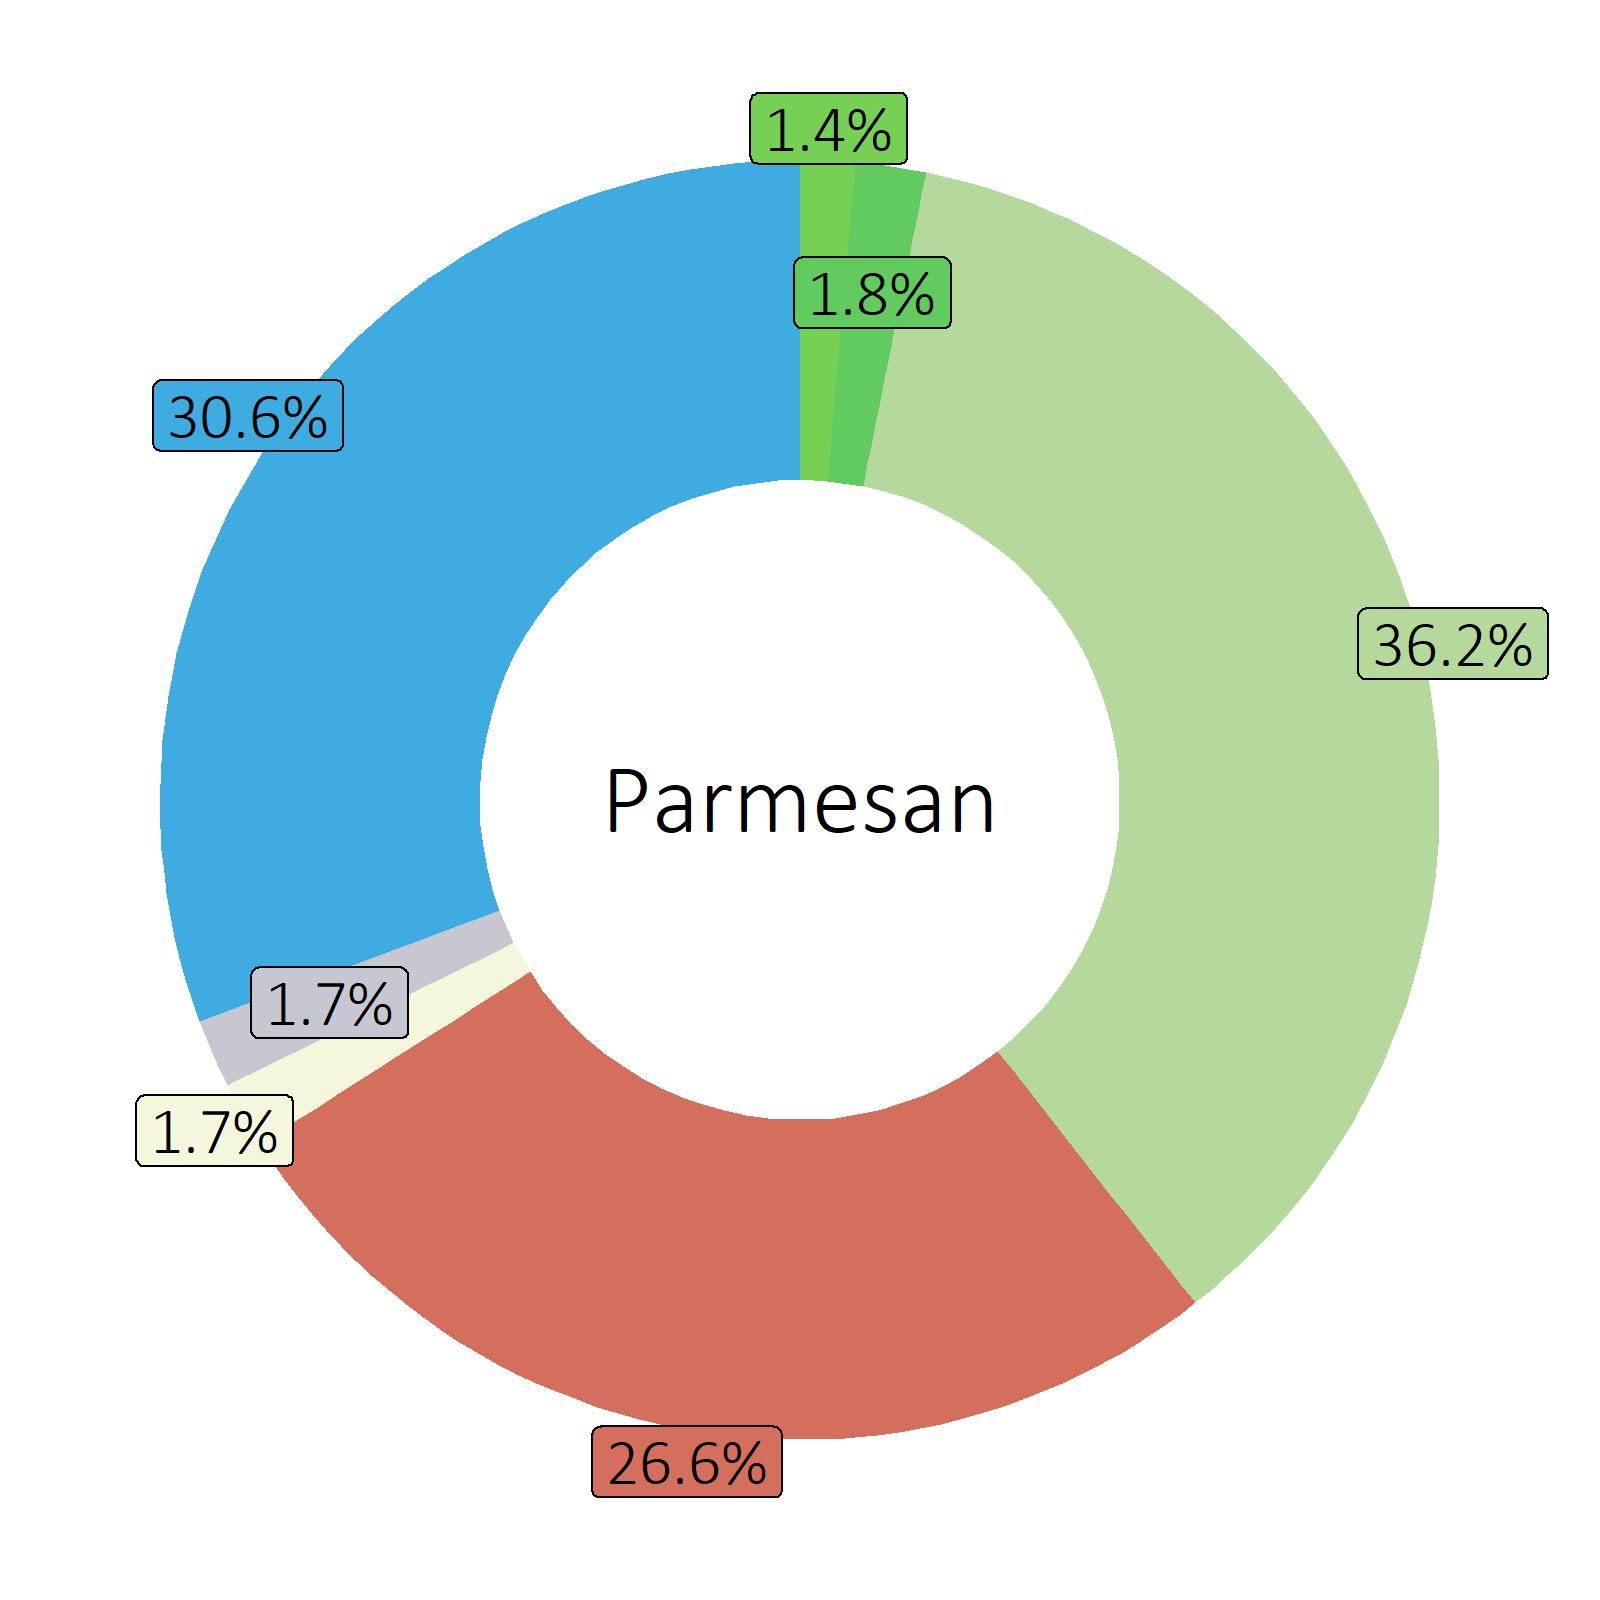 Bestandteile Parmesan